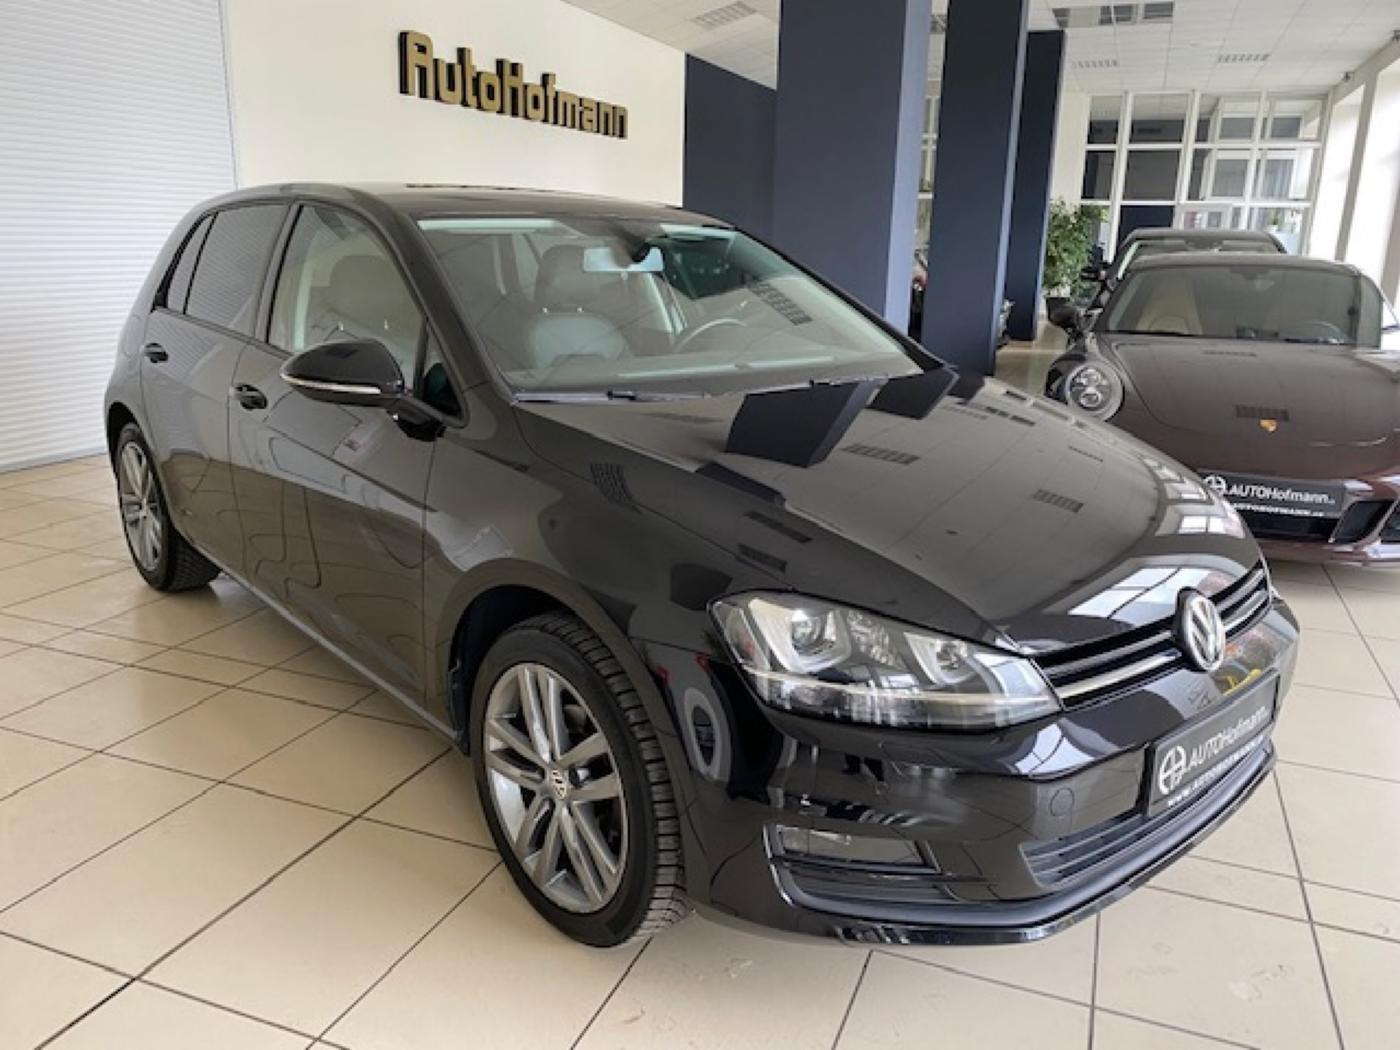 Volkswagen Golf 1,2 TSi, DSG, koupeno CZ,naj.50tis. hatchback